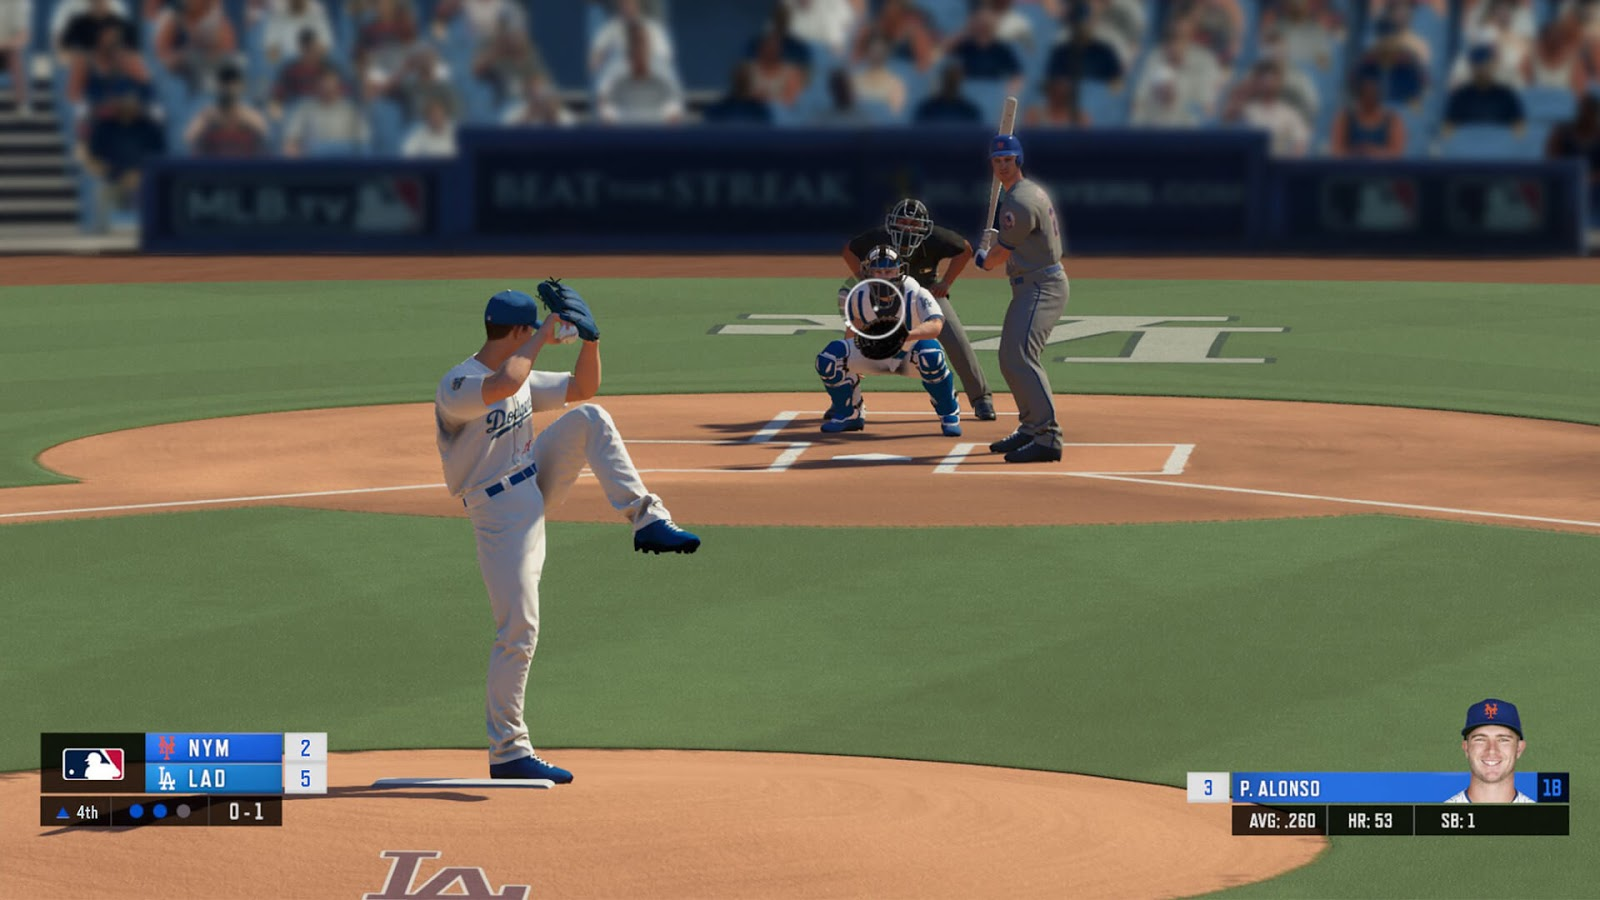 RBI Baseball 20 Full Español